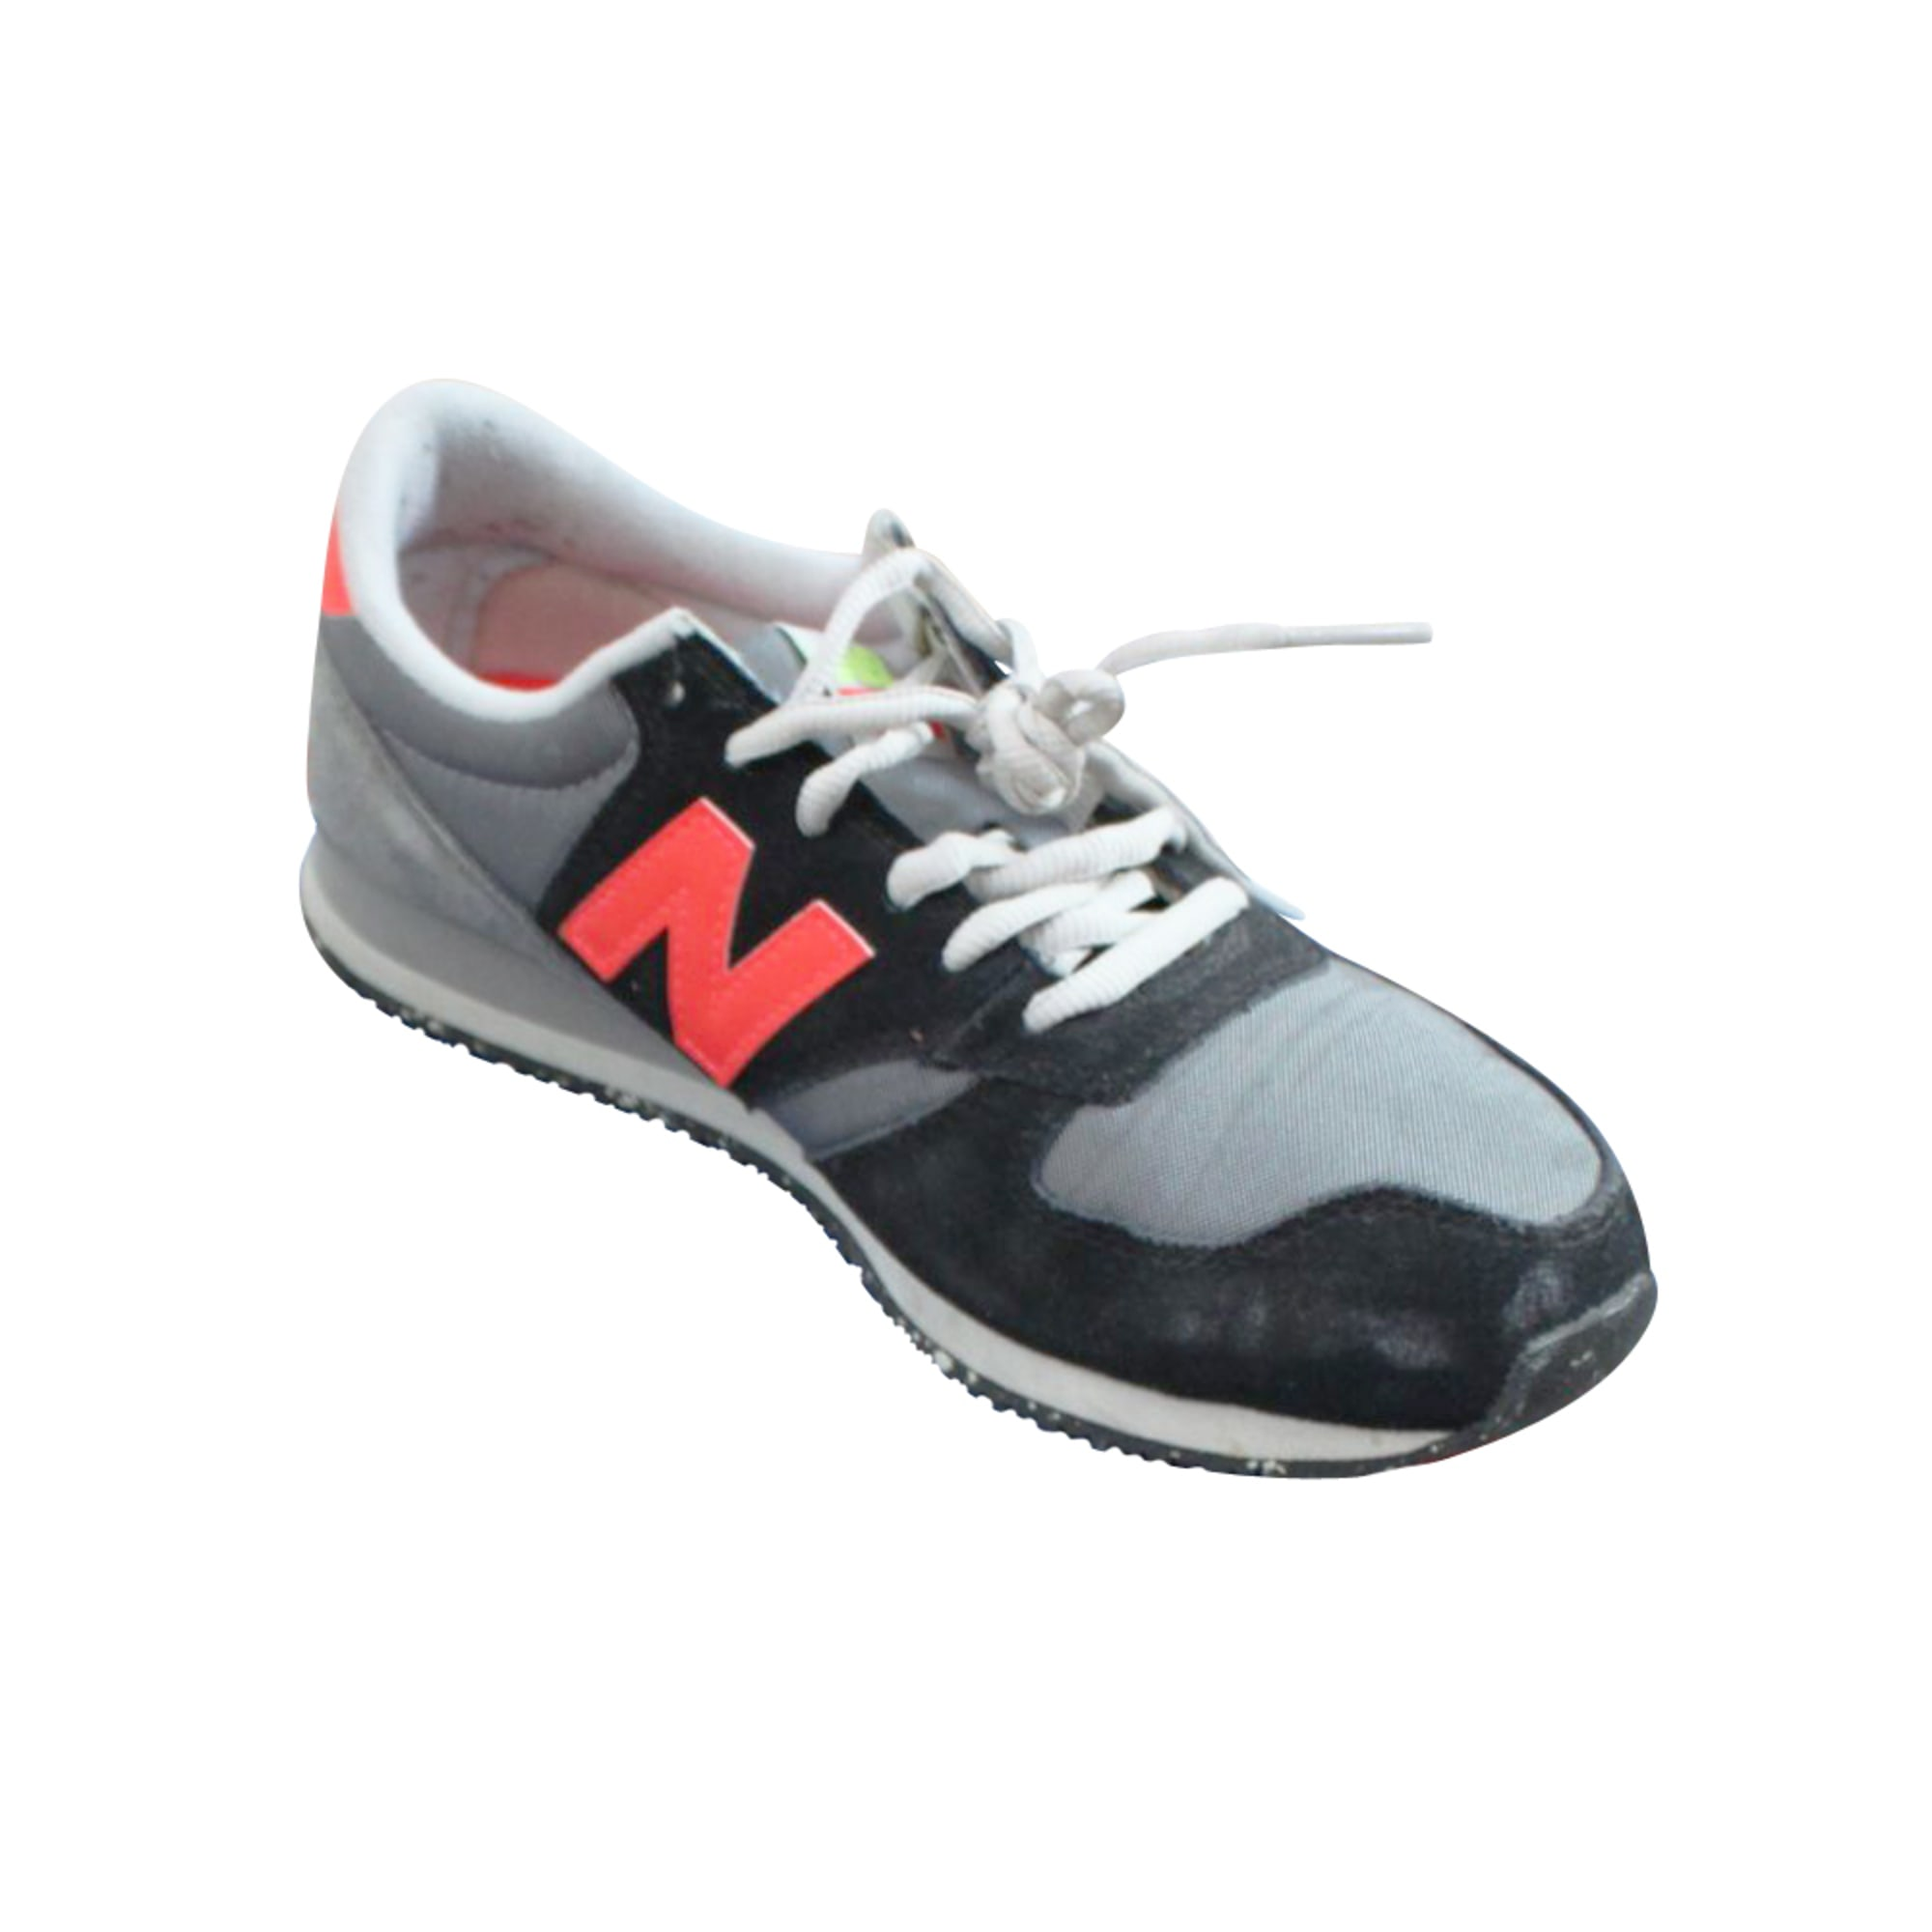 Chaussures de sport NEW BALANCE Multicouleur